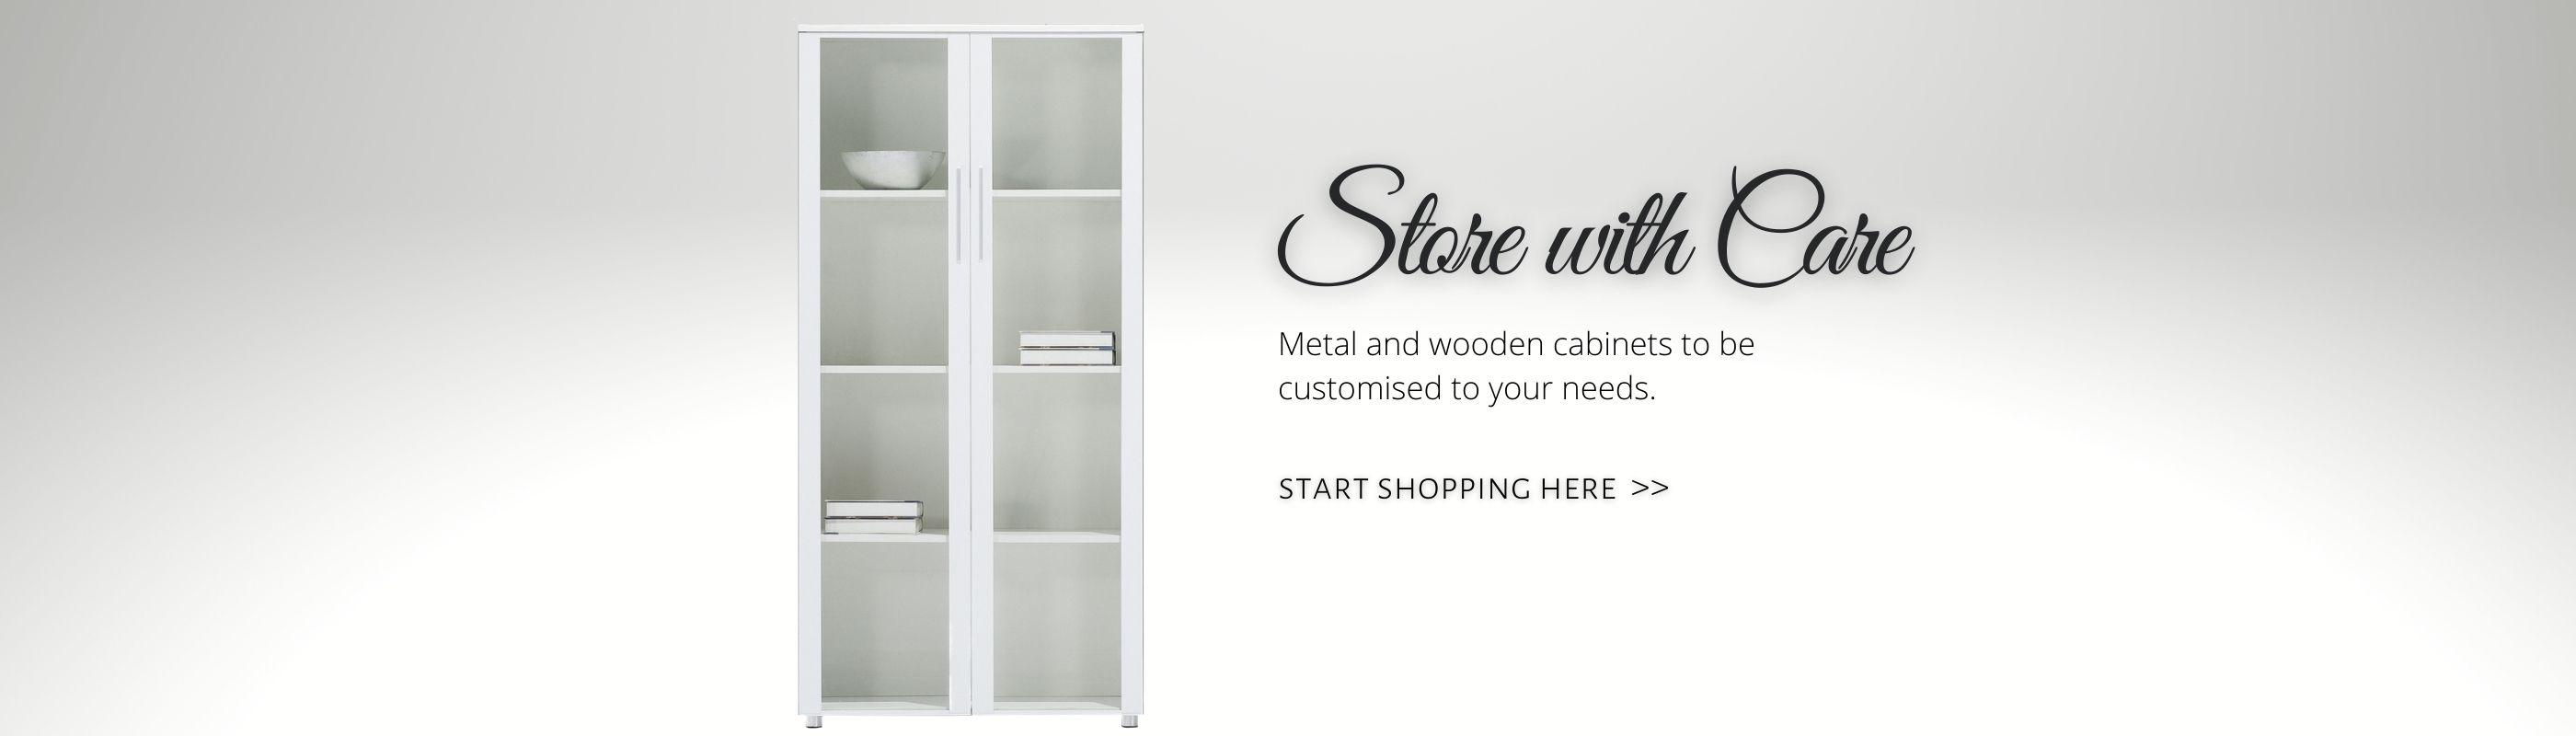 Wooden Cabinet White with Glass Door_Offitek